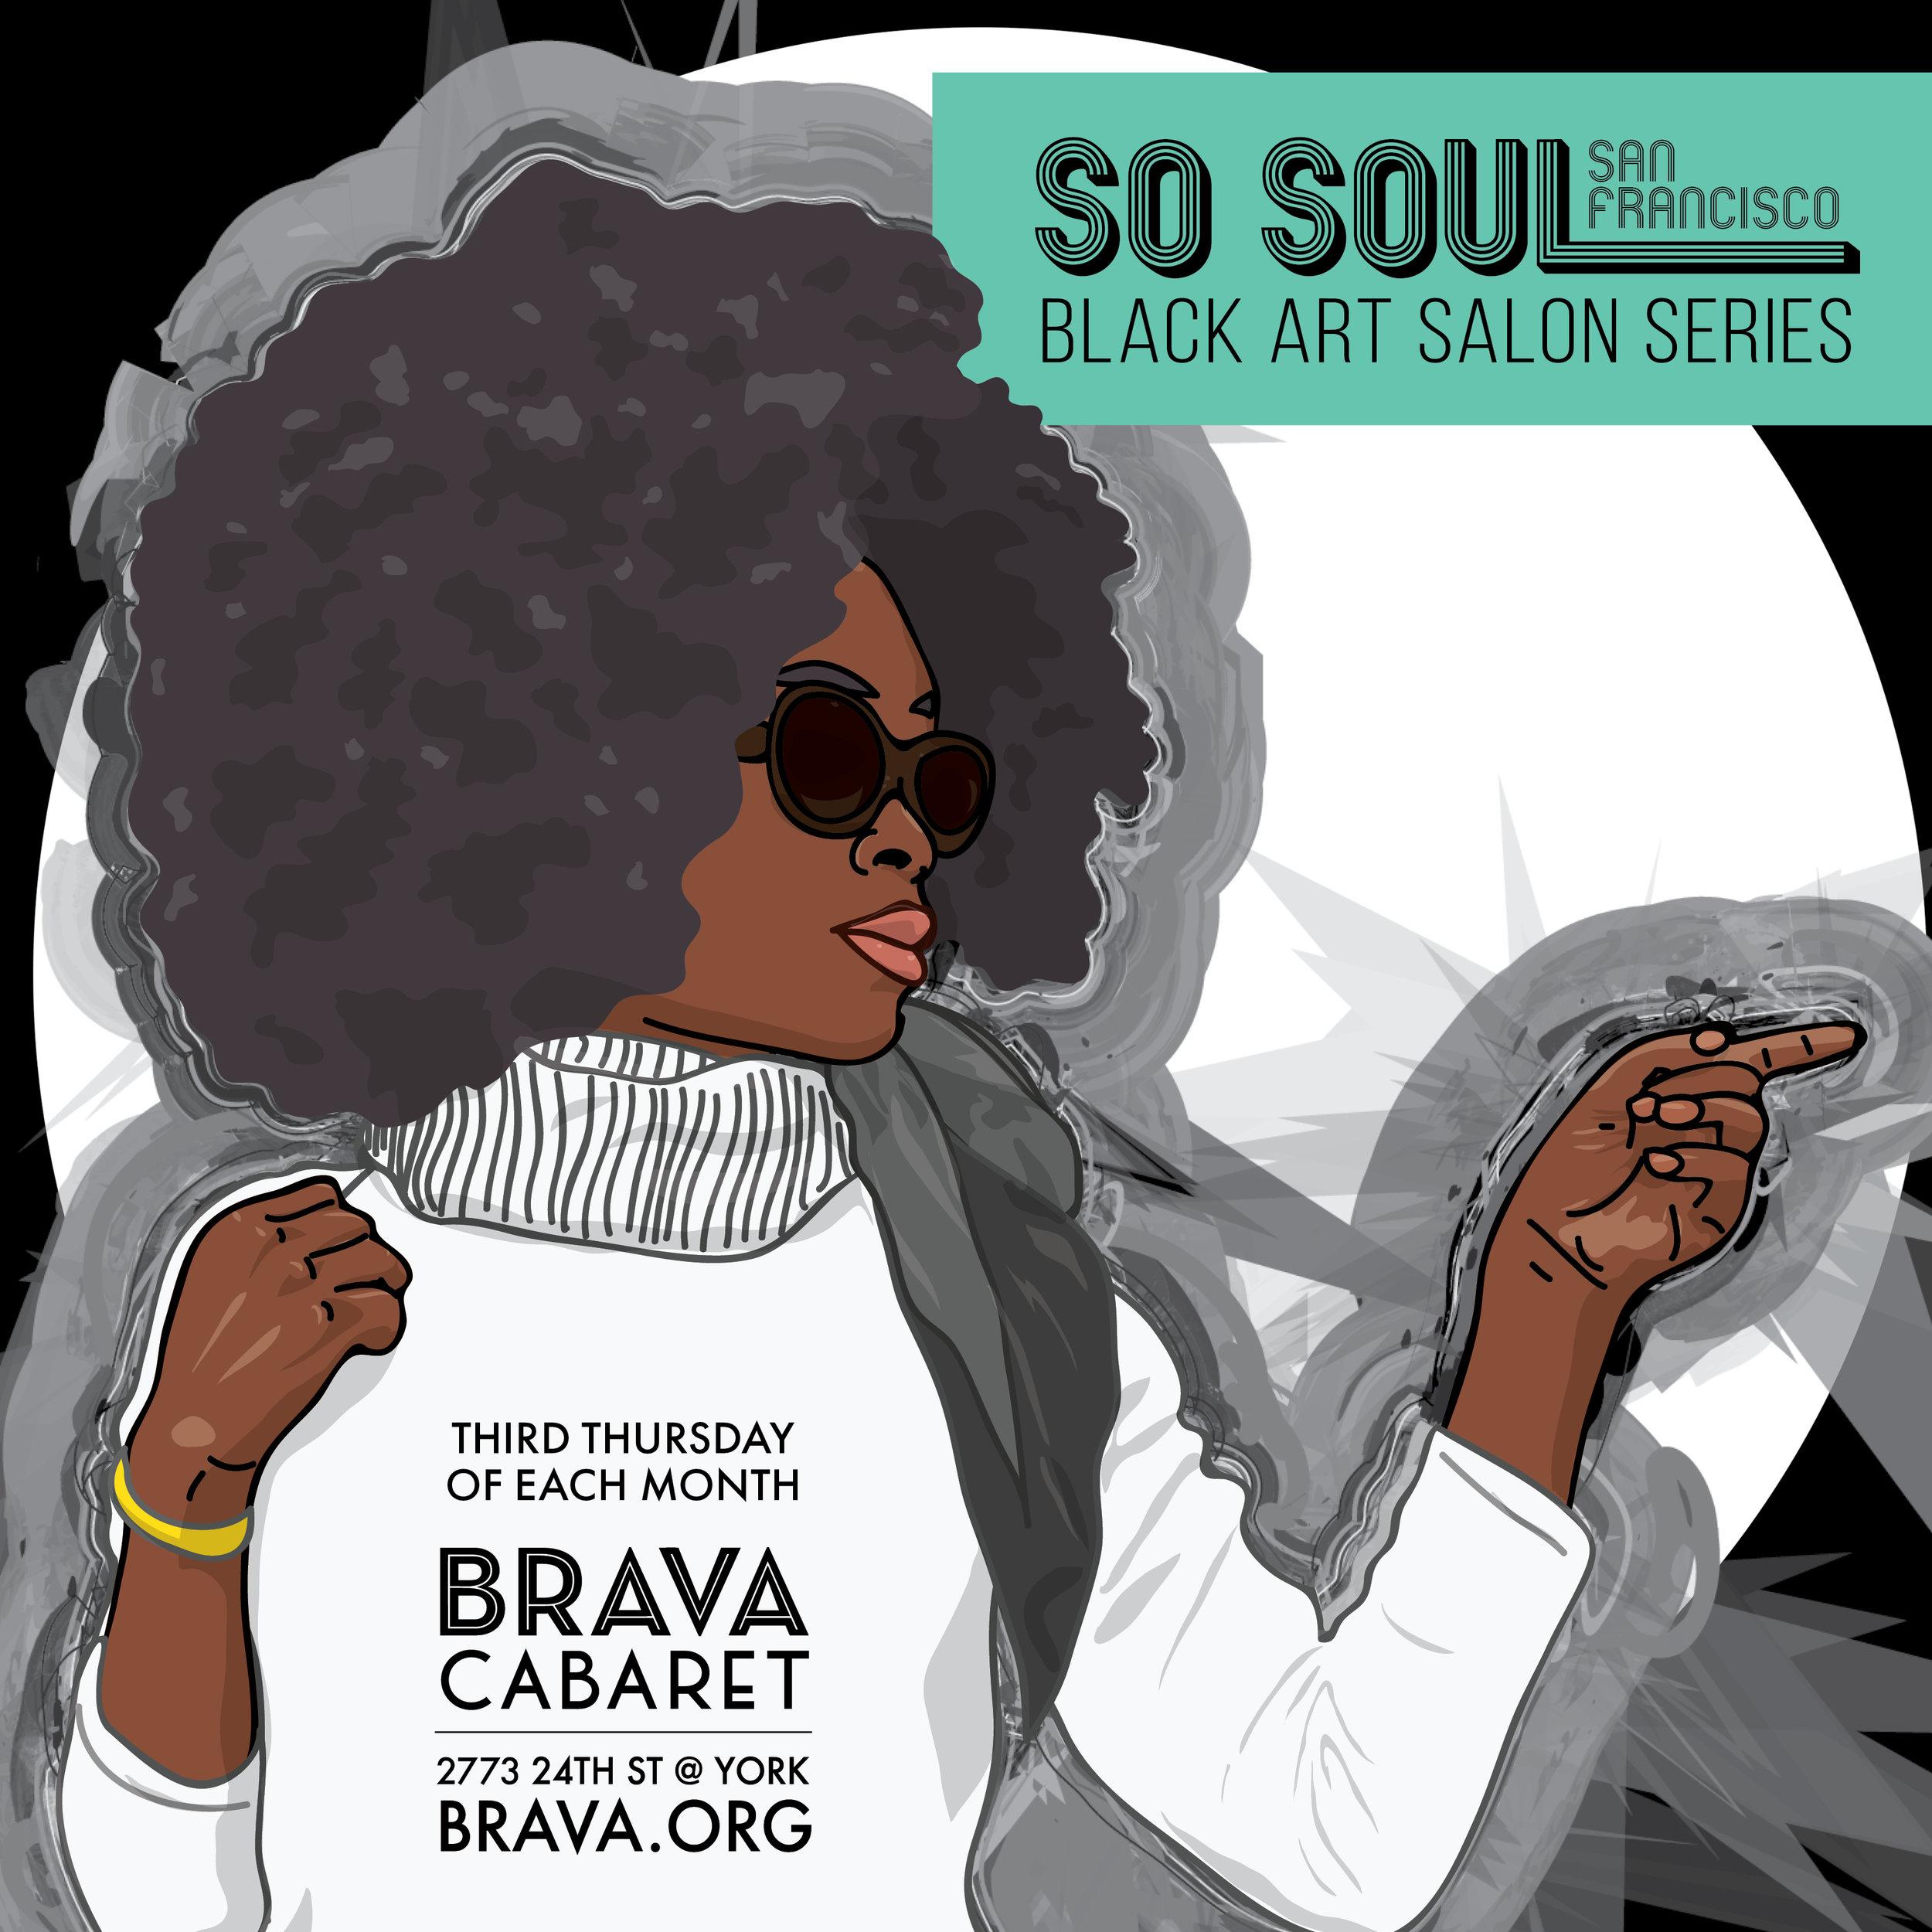 Brava, Black Art Salon 2019, social square v2.jpg